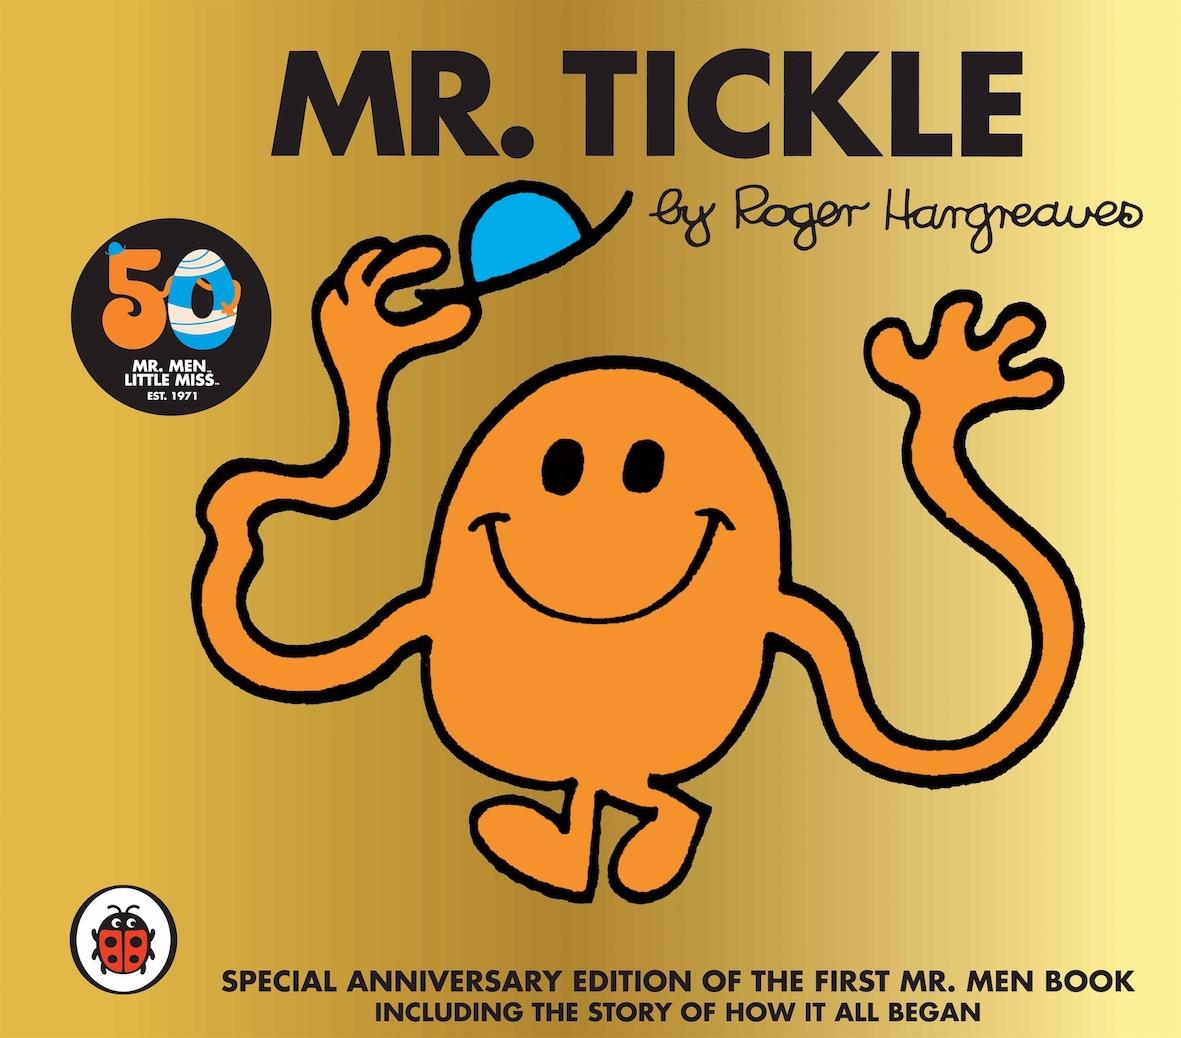 Mr Tickle prize pack